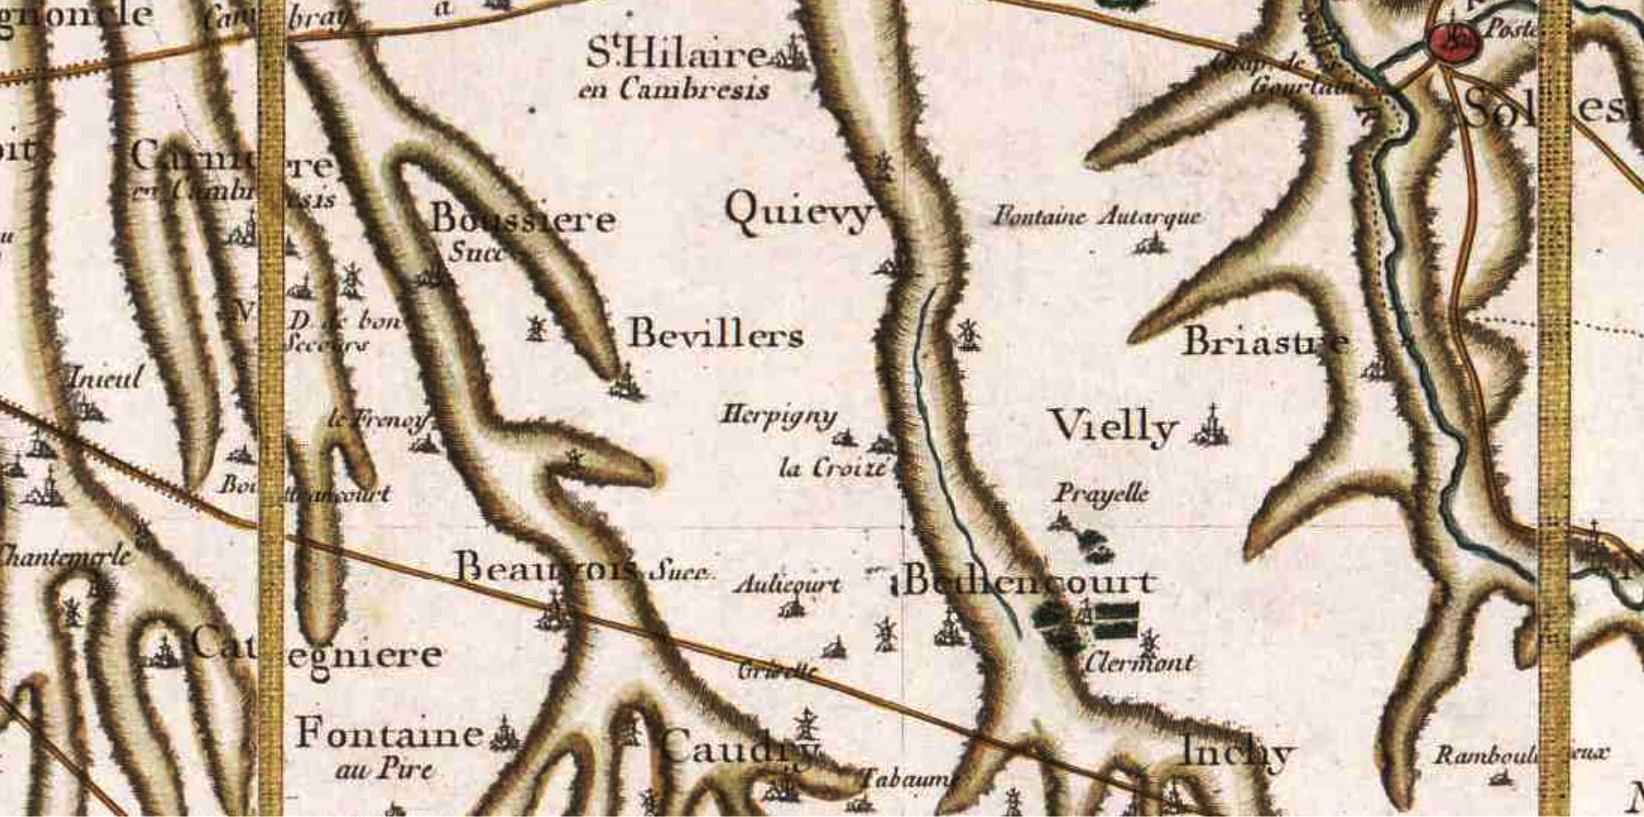 Bevillers 59 cassini